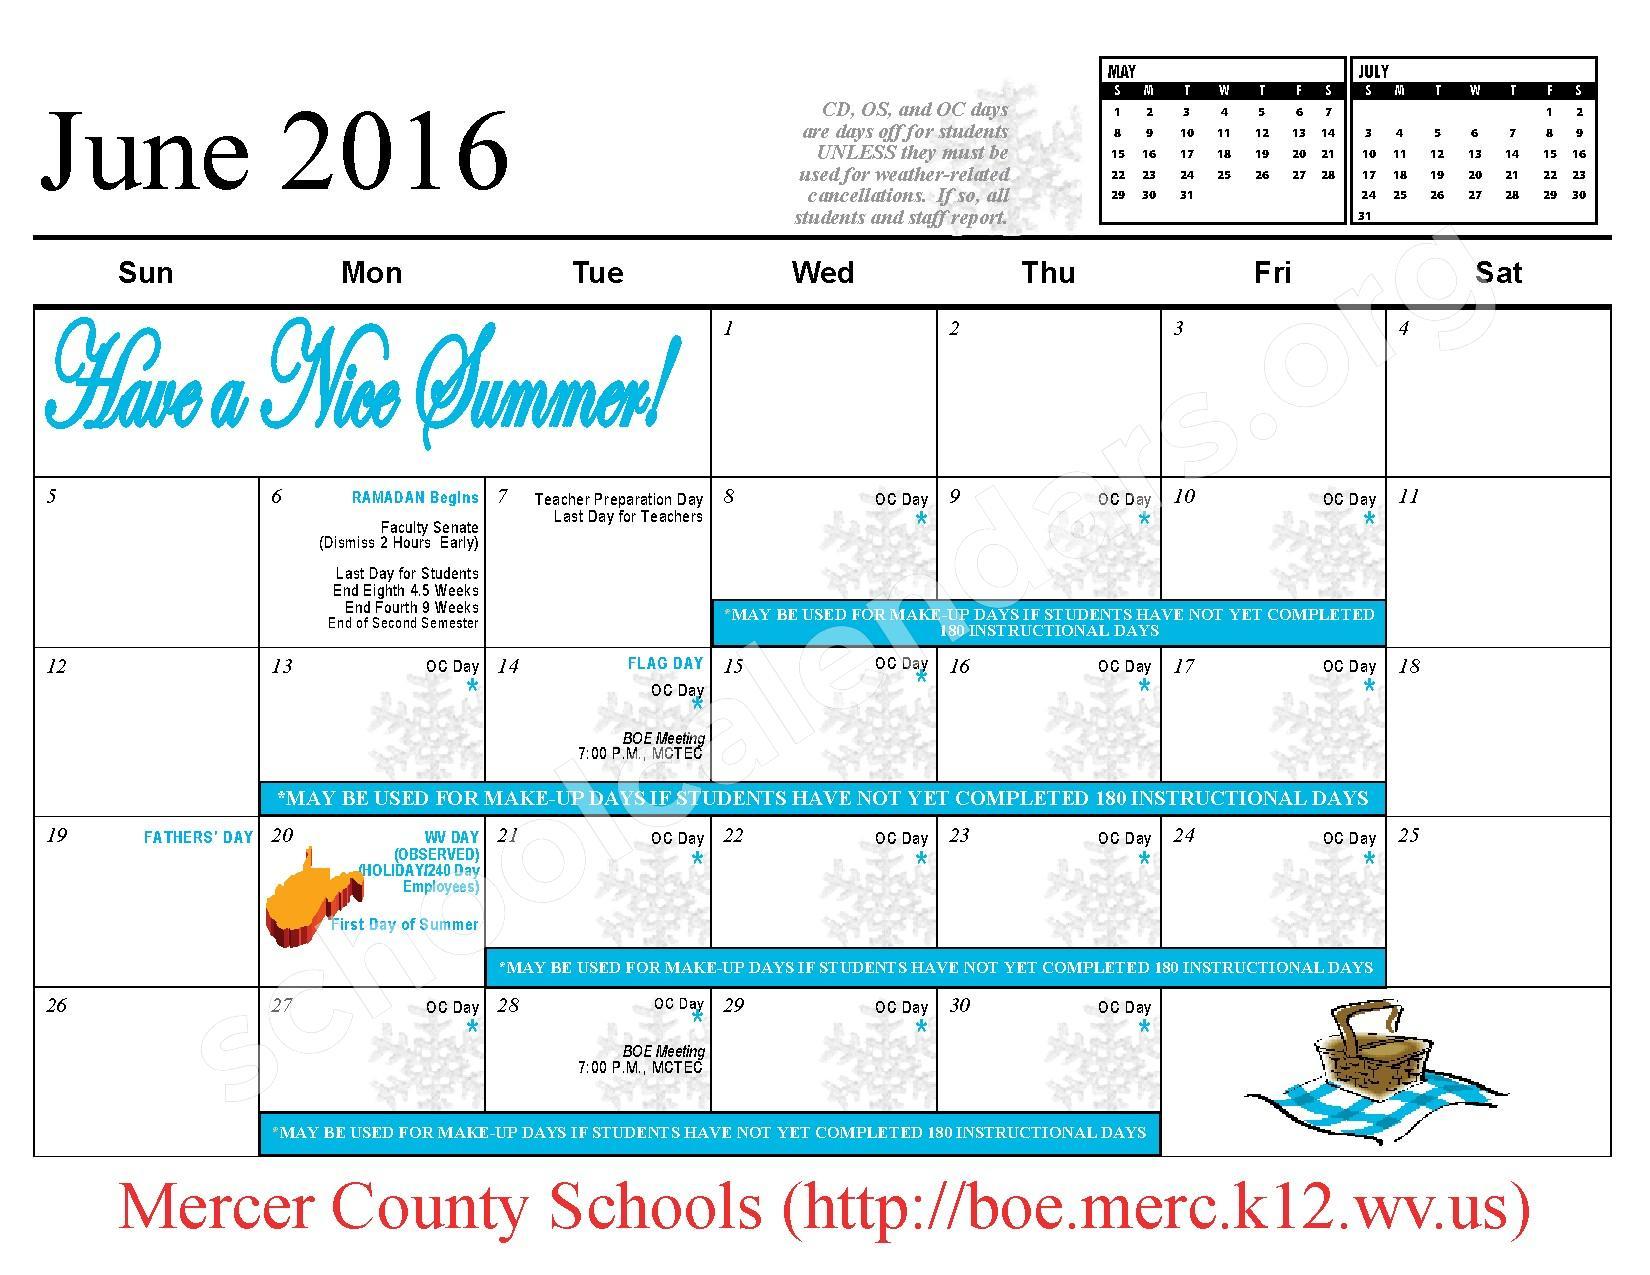 2015 - 2016 School Calendar – Mercer County Schools – page 13